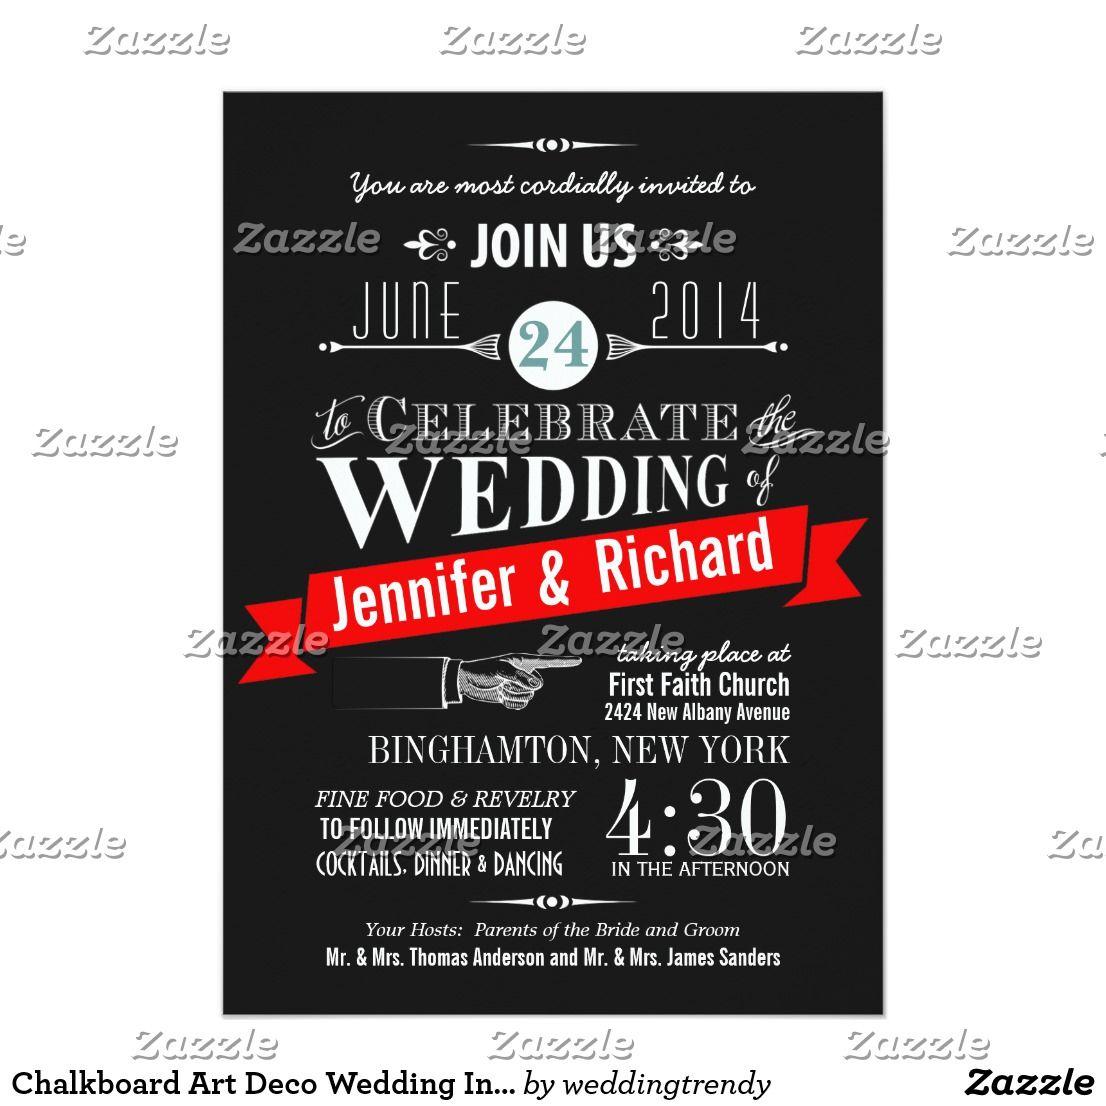 Chalkboard Art Deco Wedding Invitations   Chalk typography, Weddings ...